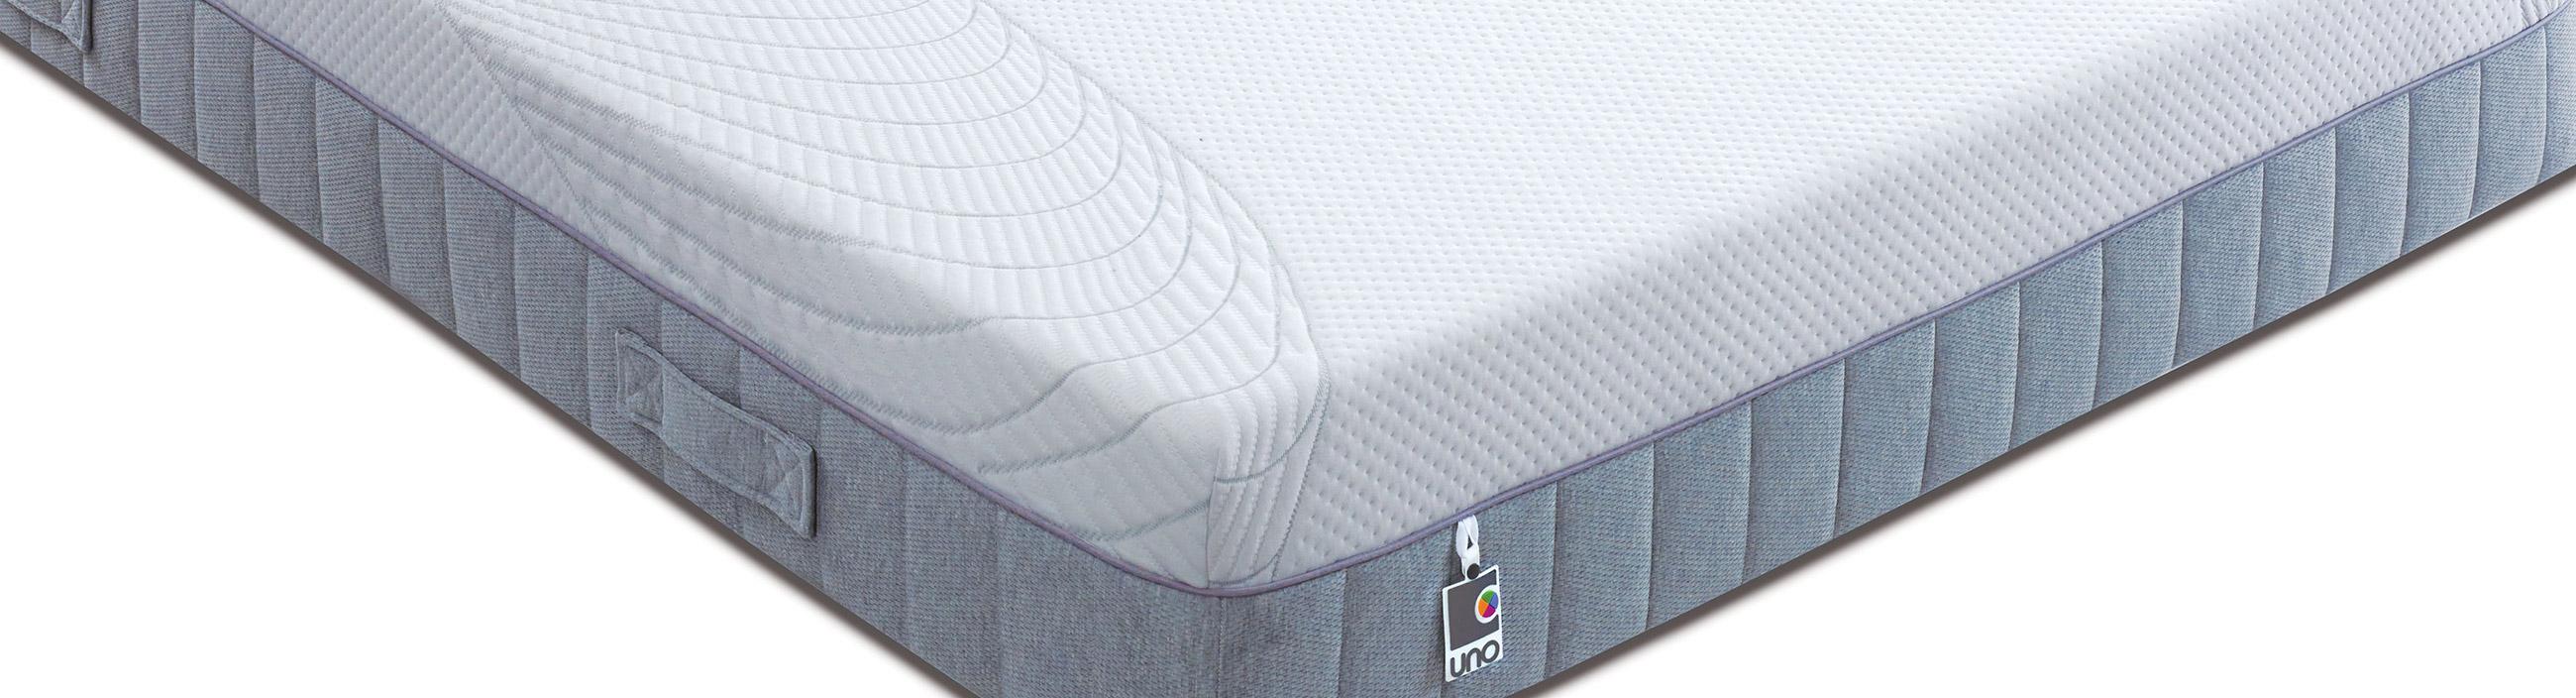 Breasley mattresses Uno mattresses